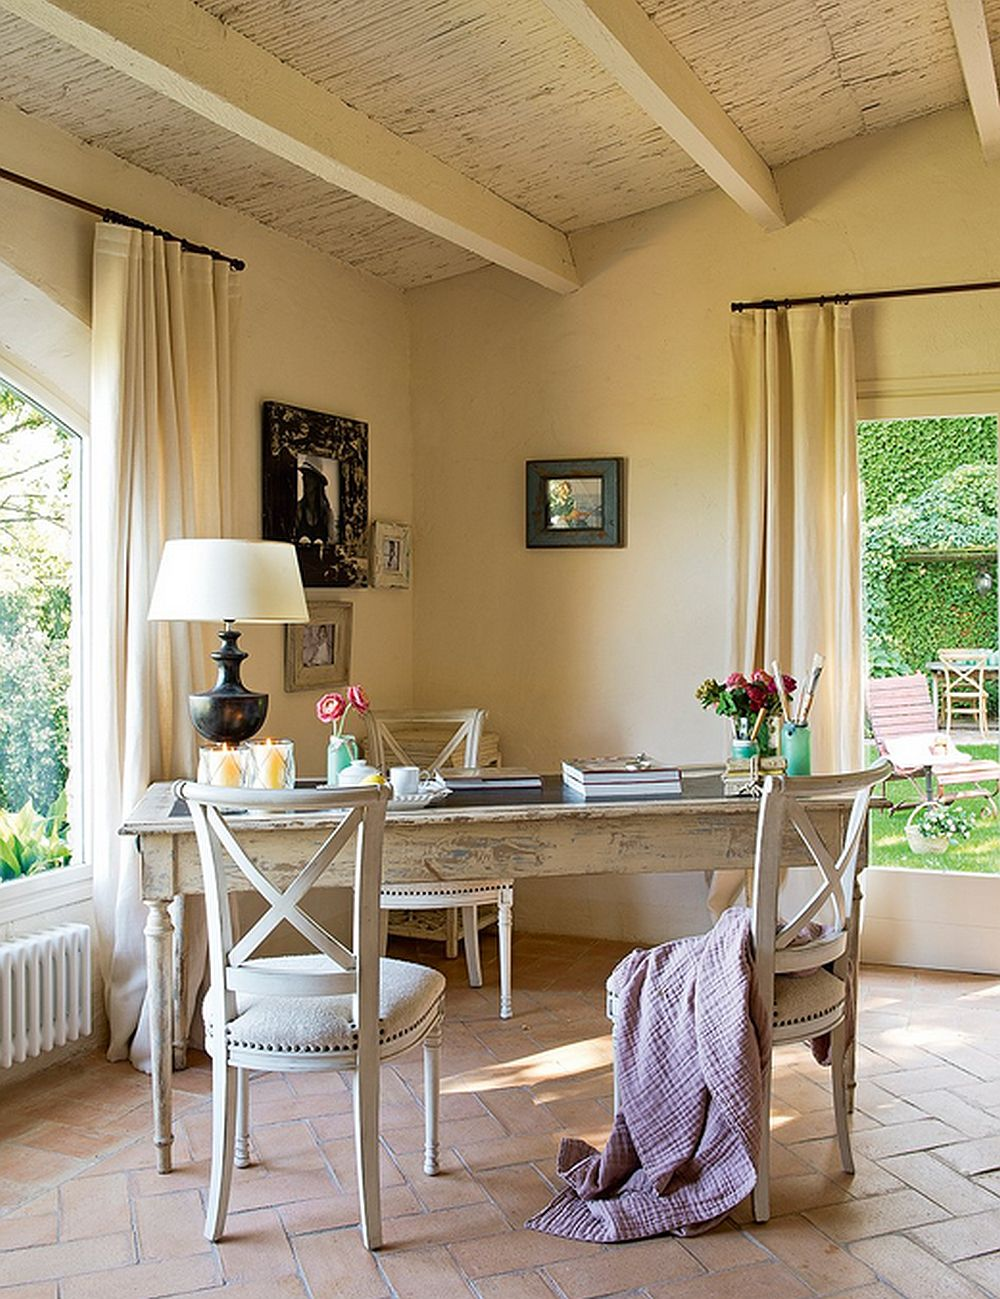 adelaparvu.com despre casa rustica Spania, hambar transformat in casa, arhitecti Lluís Auquer si Ferran Prats (13)